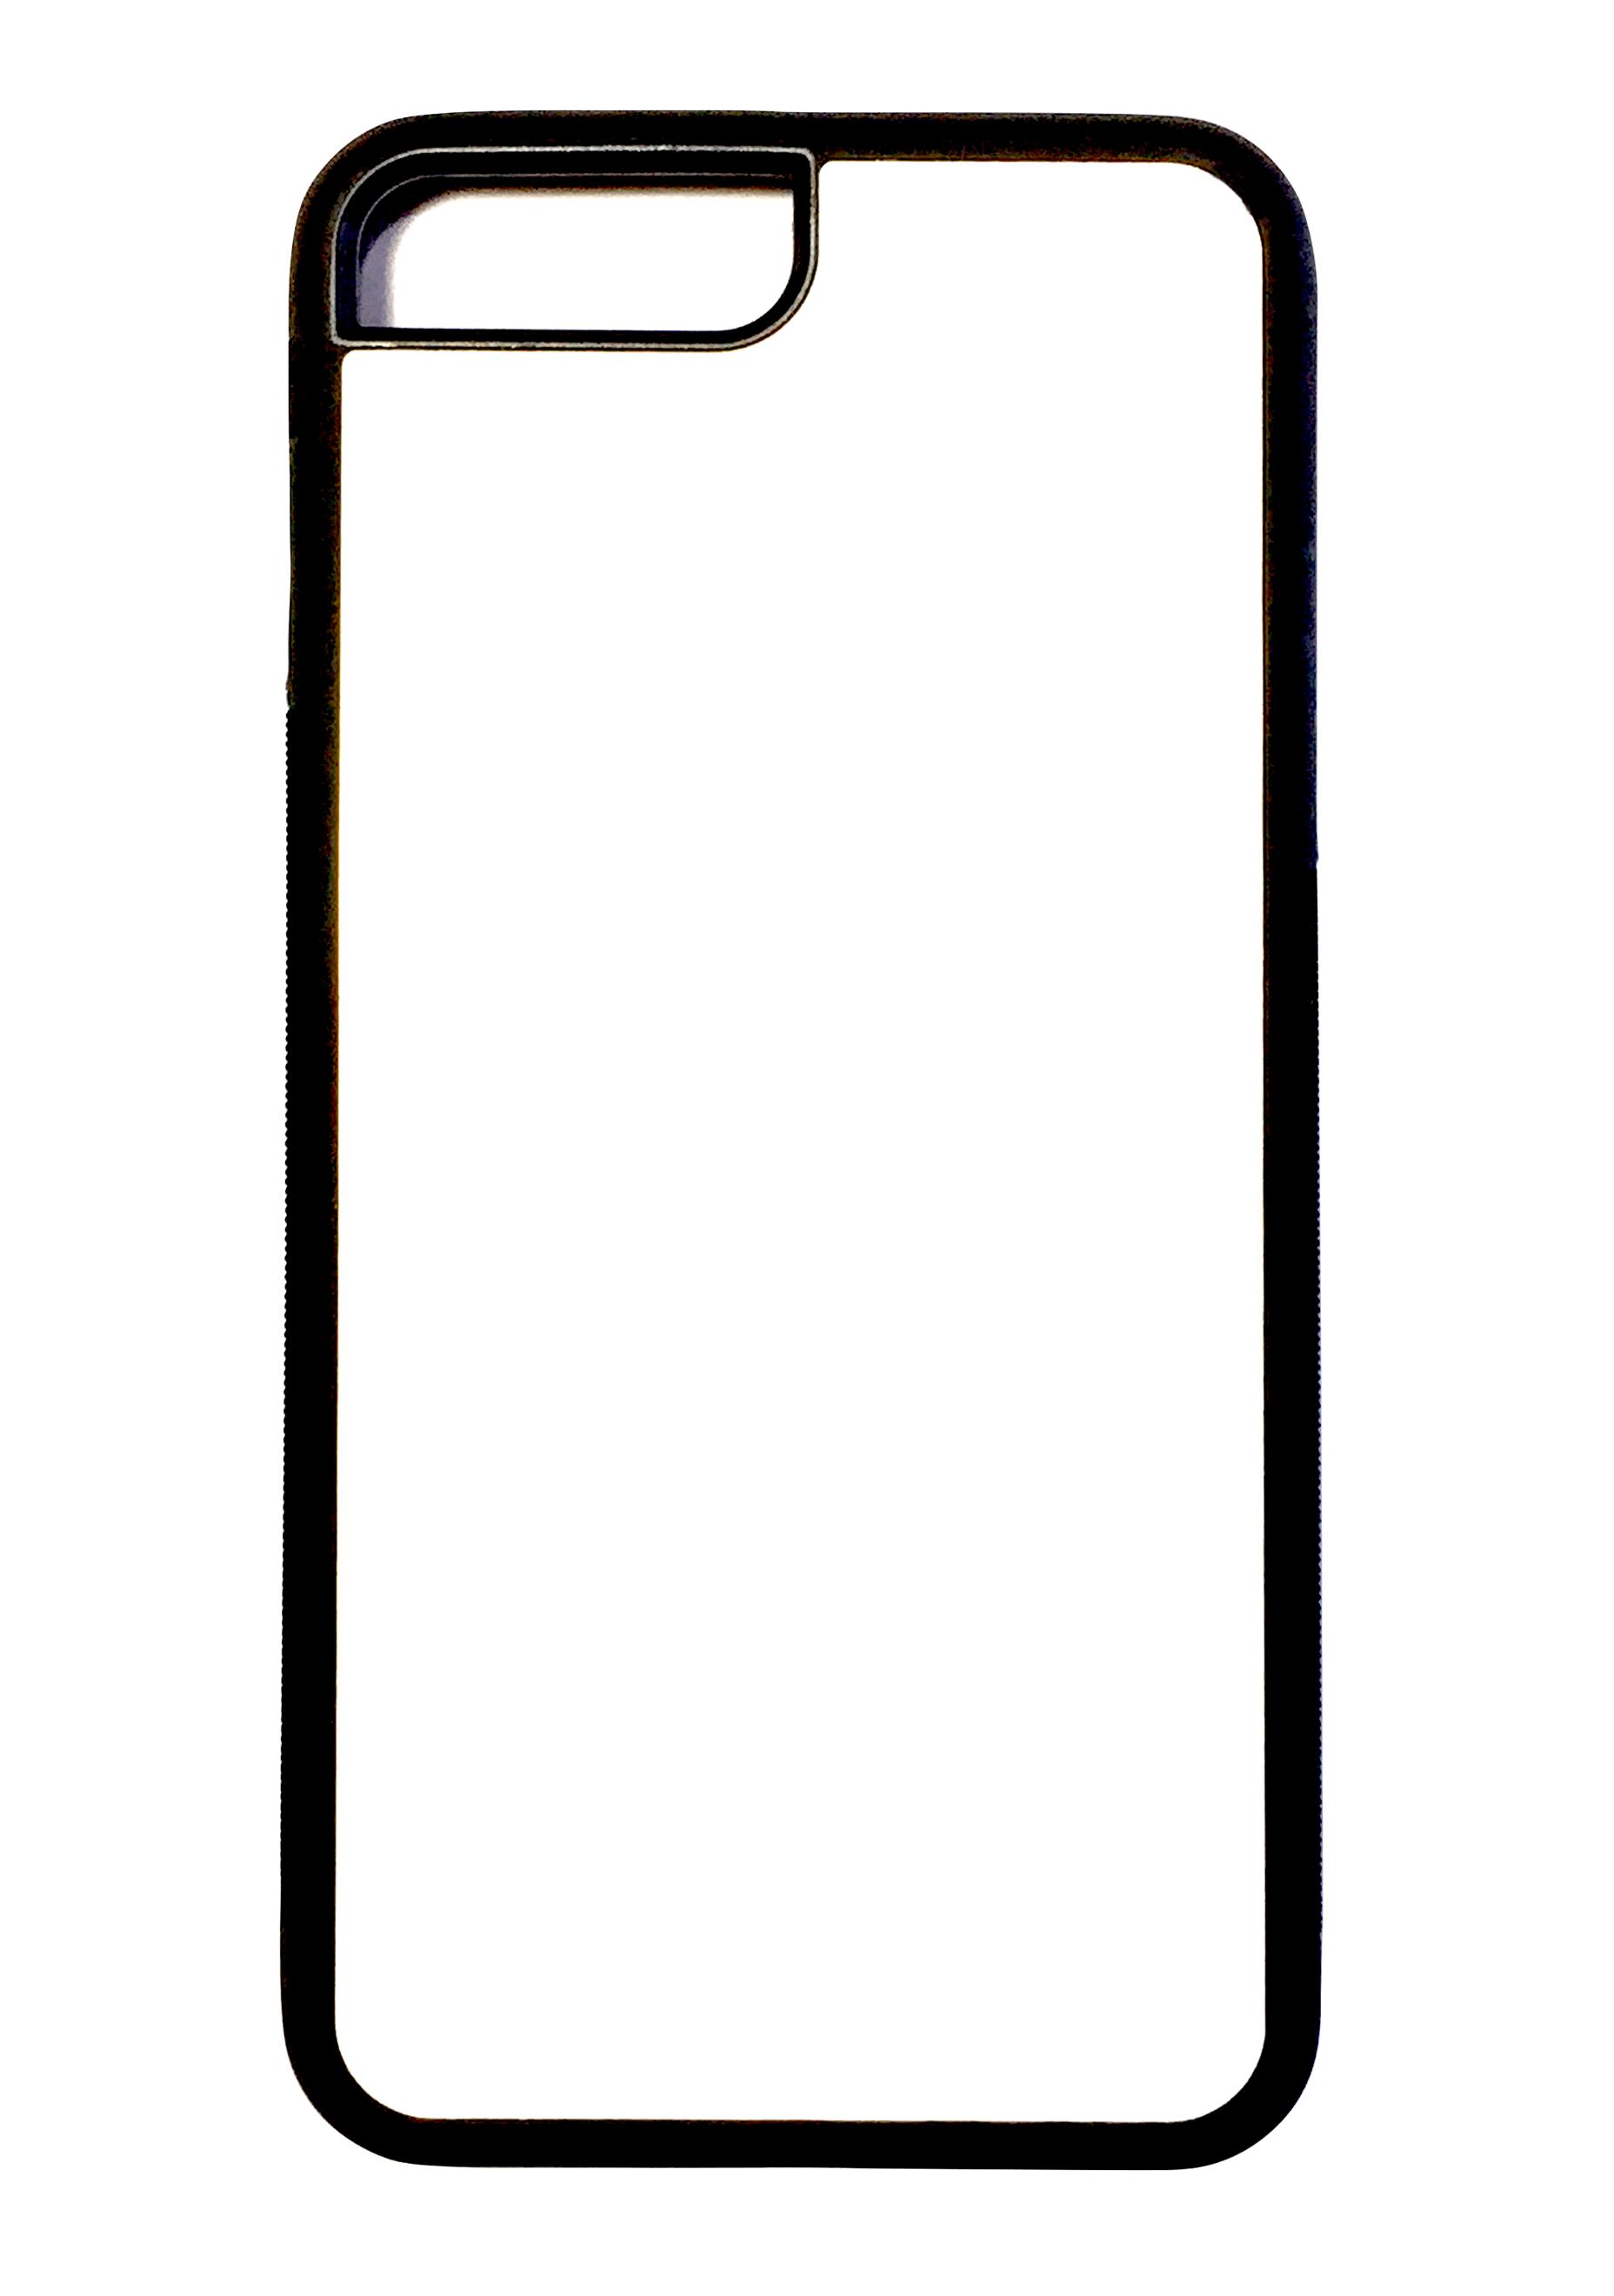 06e8e7e34c7 iPhone 7 Plus / iPhone 8 Plus – Carcasa Madera borde Premium | Carcasas  Personalizadas Wowmart.cl